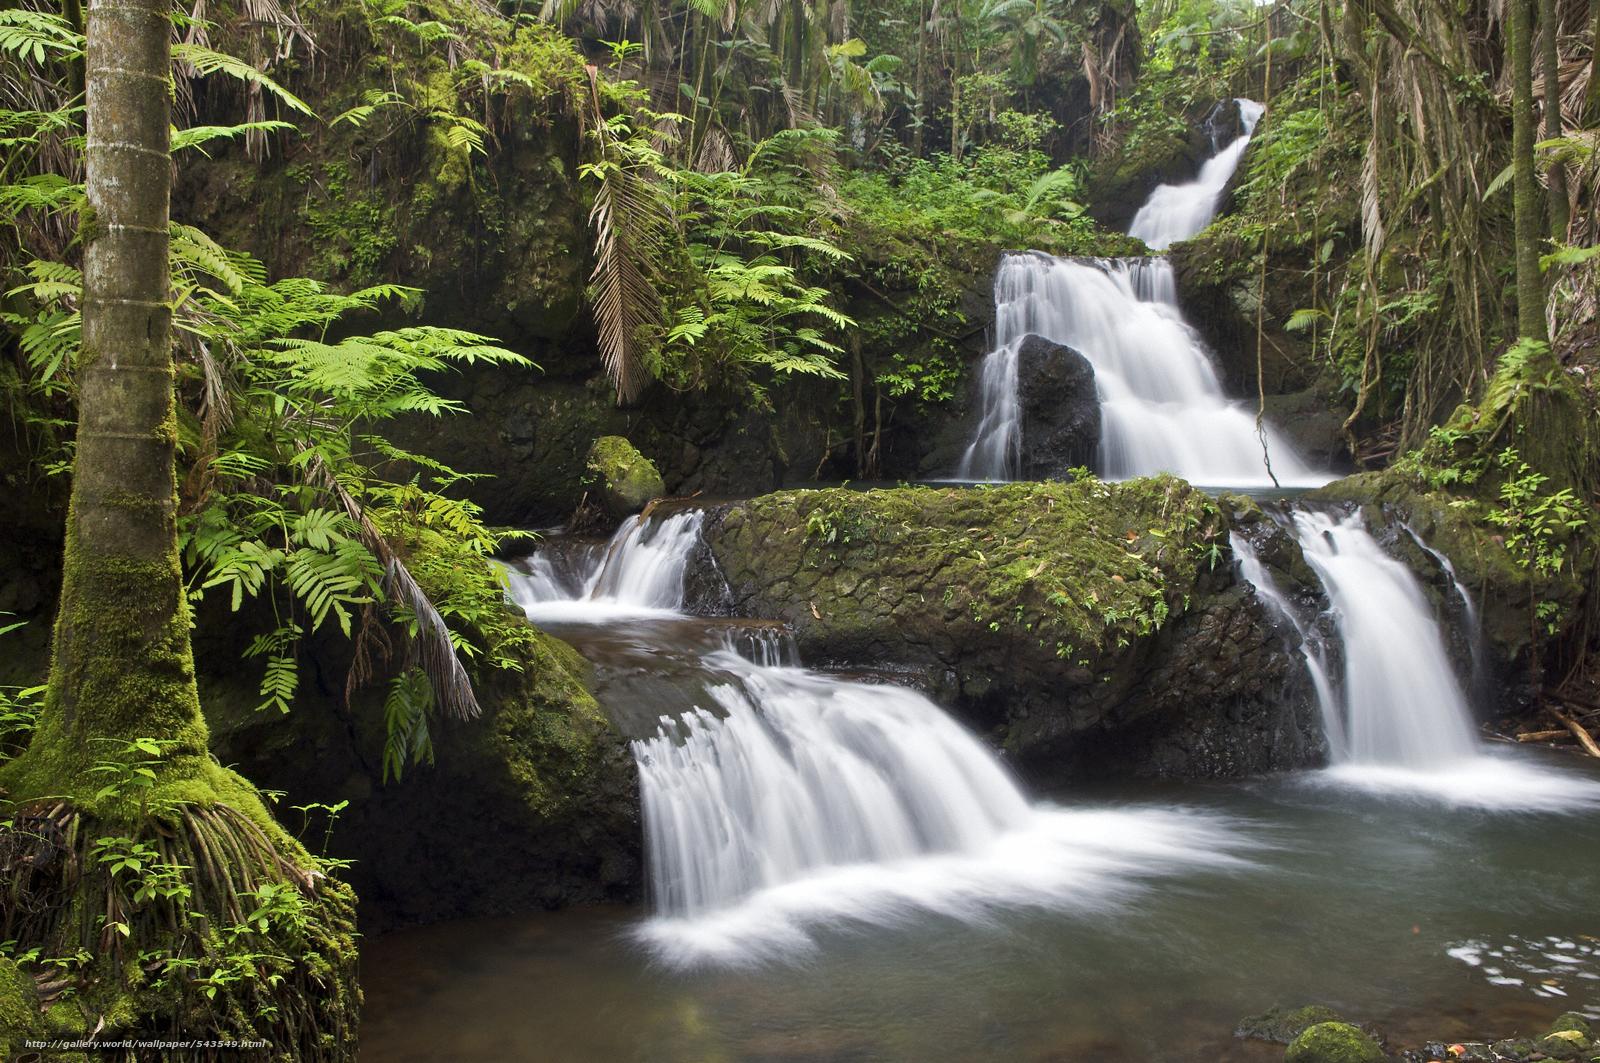 Download wallpaper Jungle Waterfall, South Hilo, Hawaii, nature